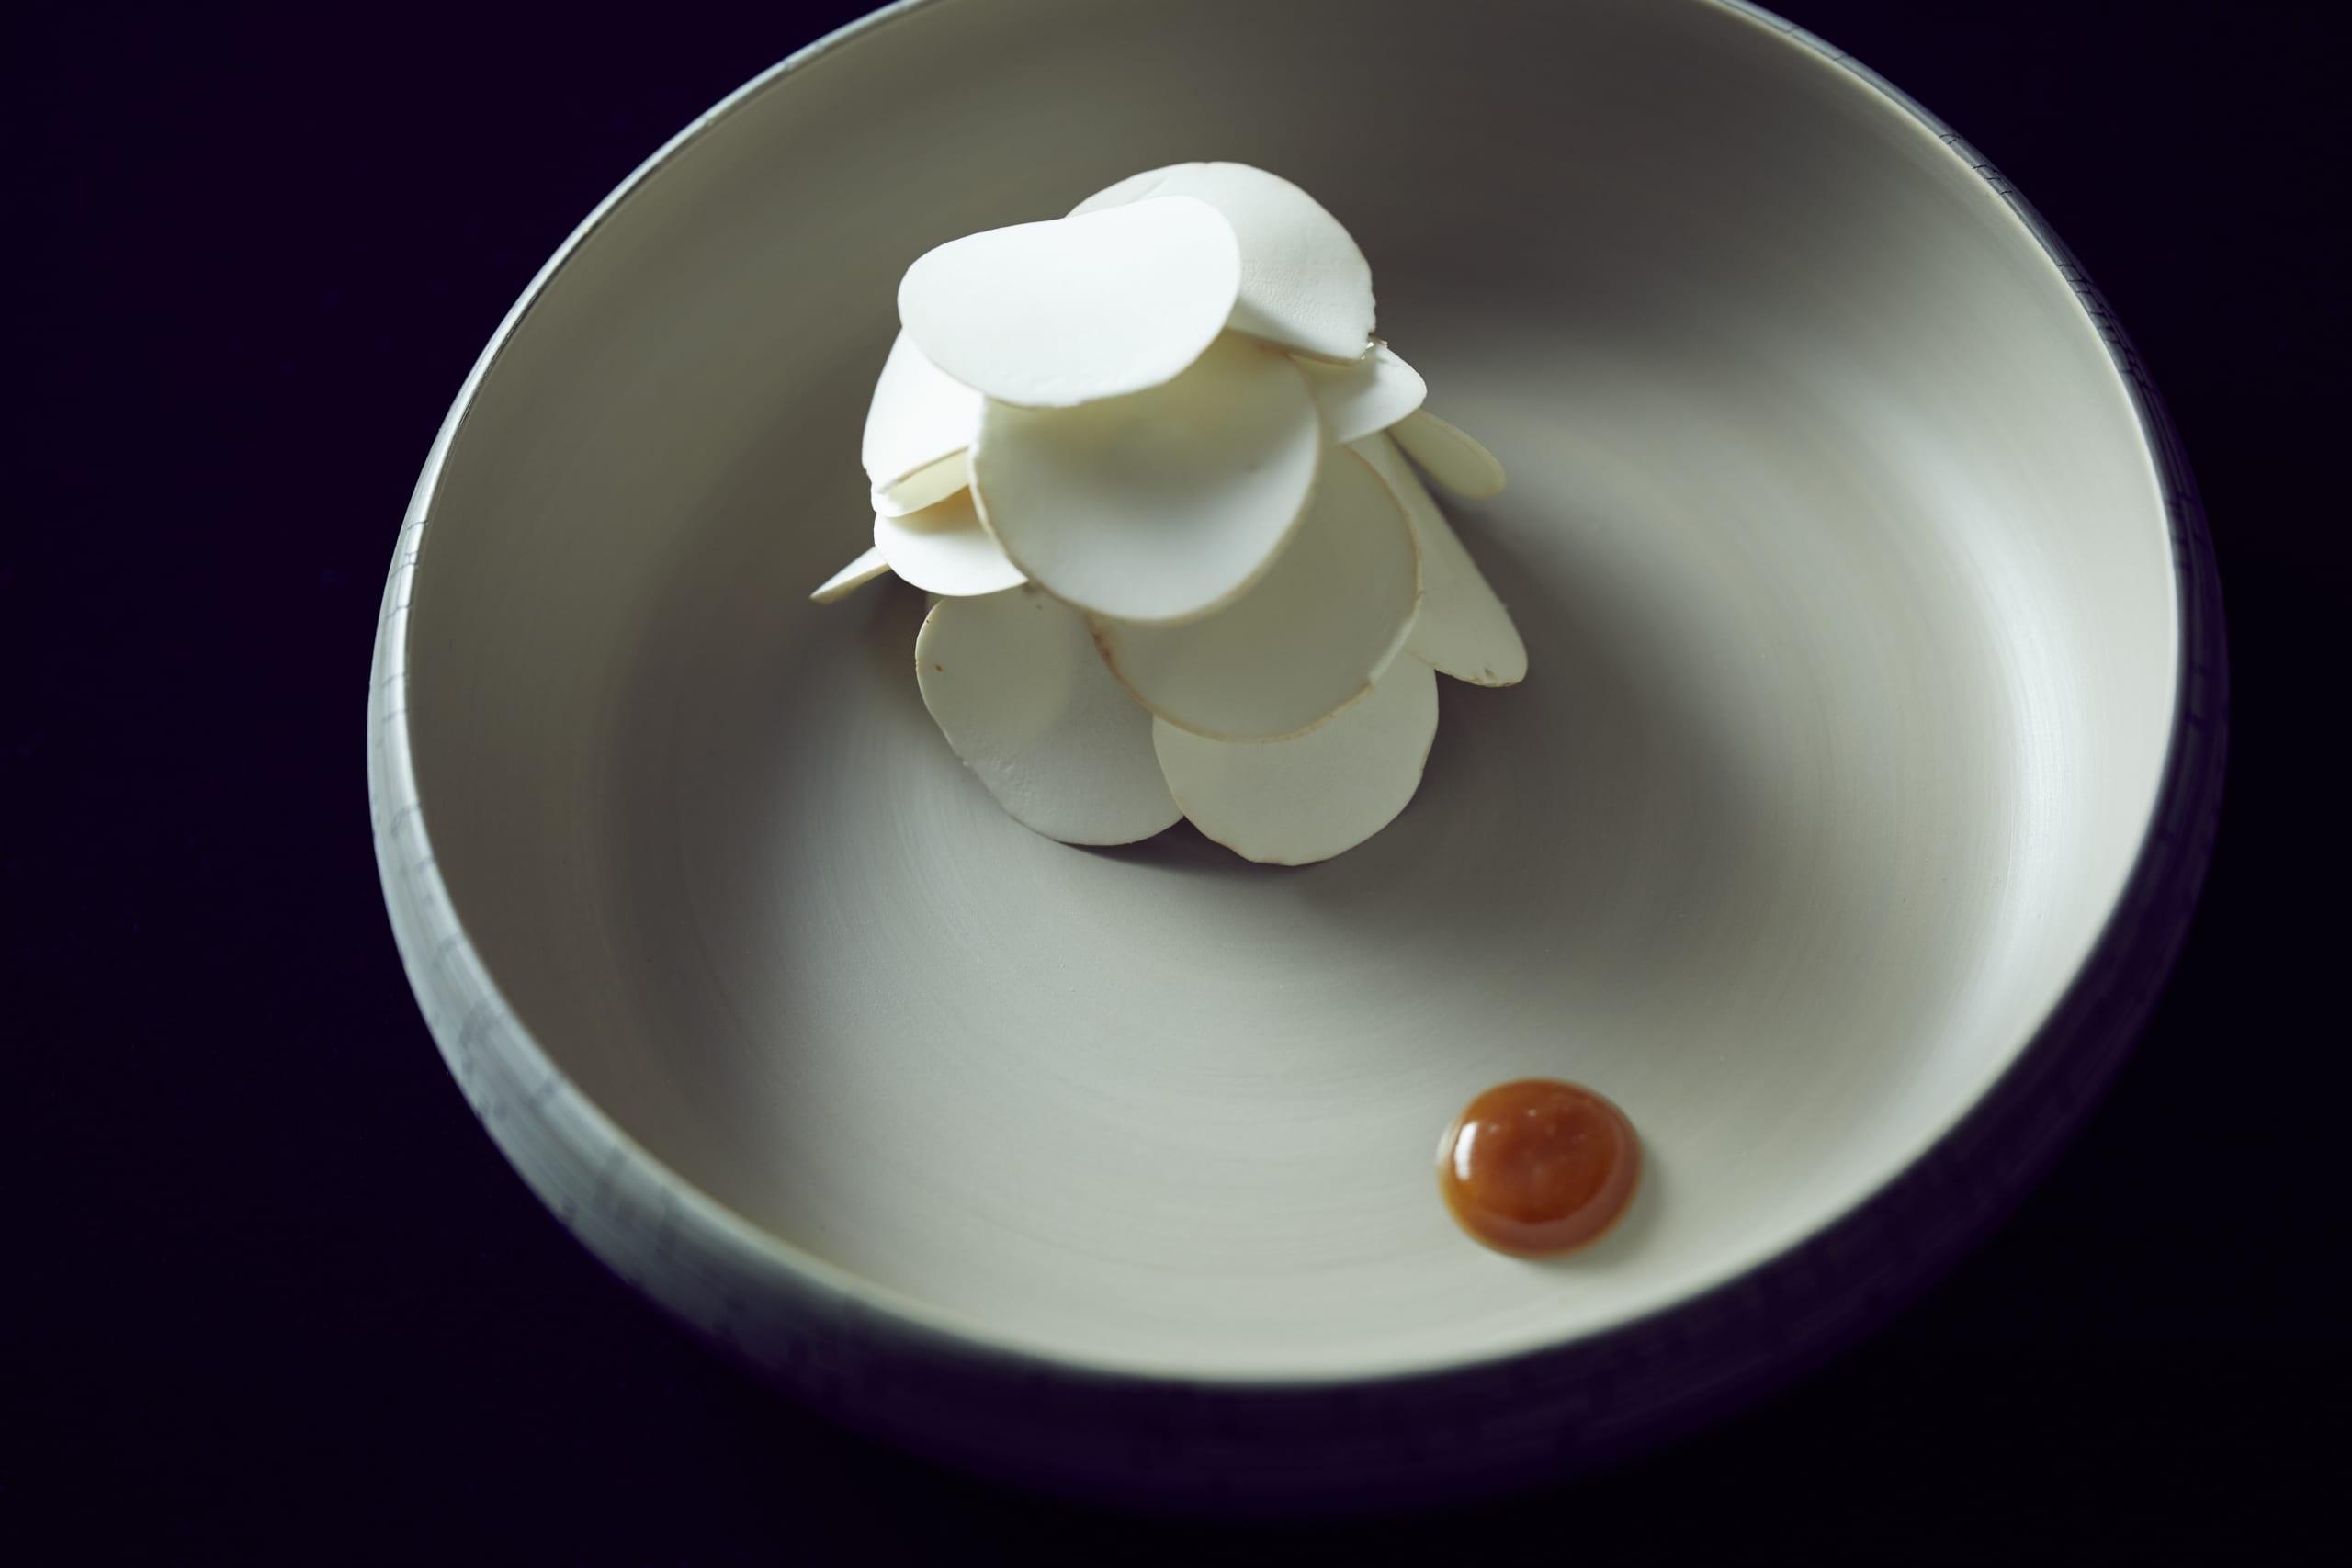 200716 HOMMAGE 0155s1 scaled 2 Star Michelin Chef Noboru Arai   Restaurant Hommage Tokyo meets Rochini